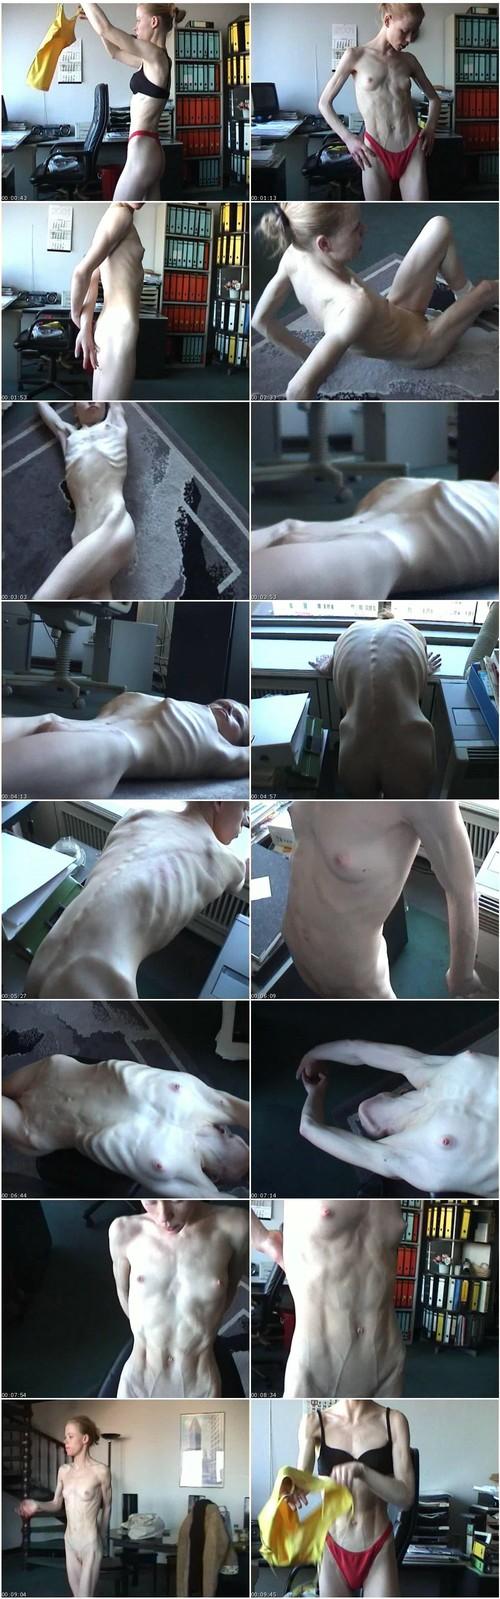 http://ist5-1.filesor.com/pimpandhost.com/9/6/8/3/96838/6/2/q/O/62qOa/Anorexia037_thumb_m.jpg